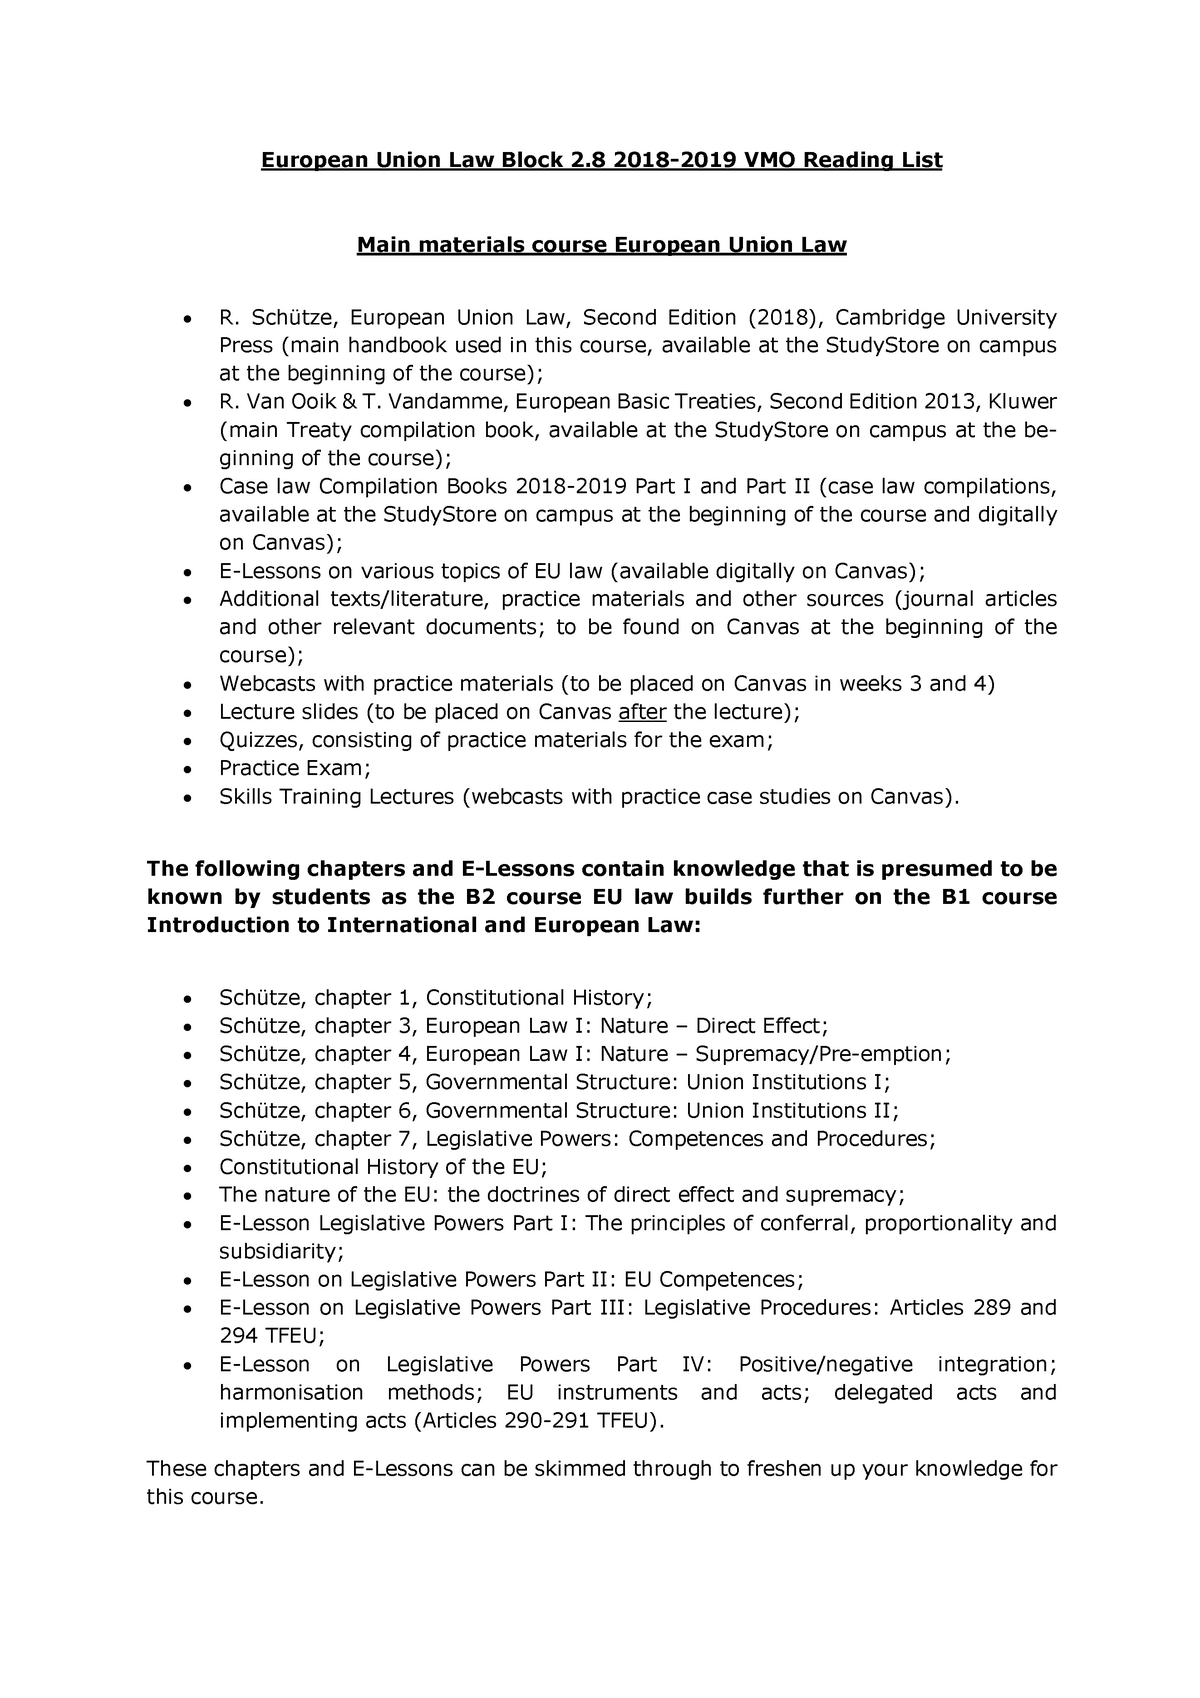 Reading+List+VMO+European+Union+Law+2018-2019 - RR202